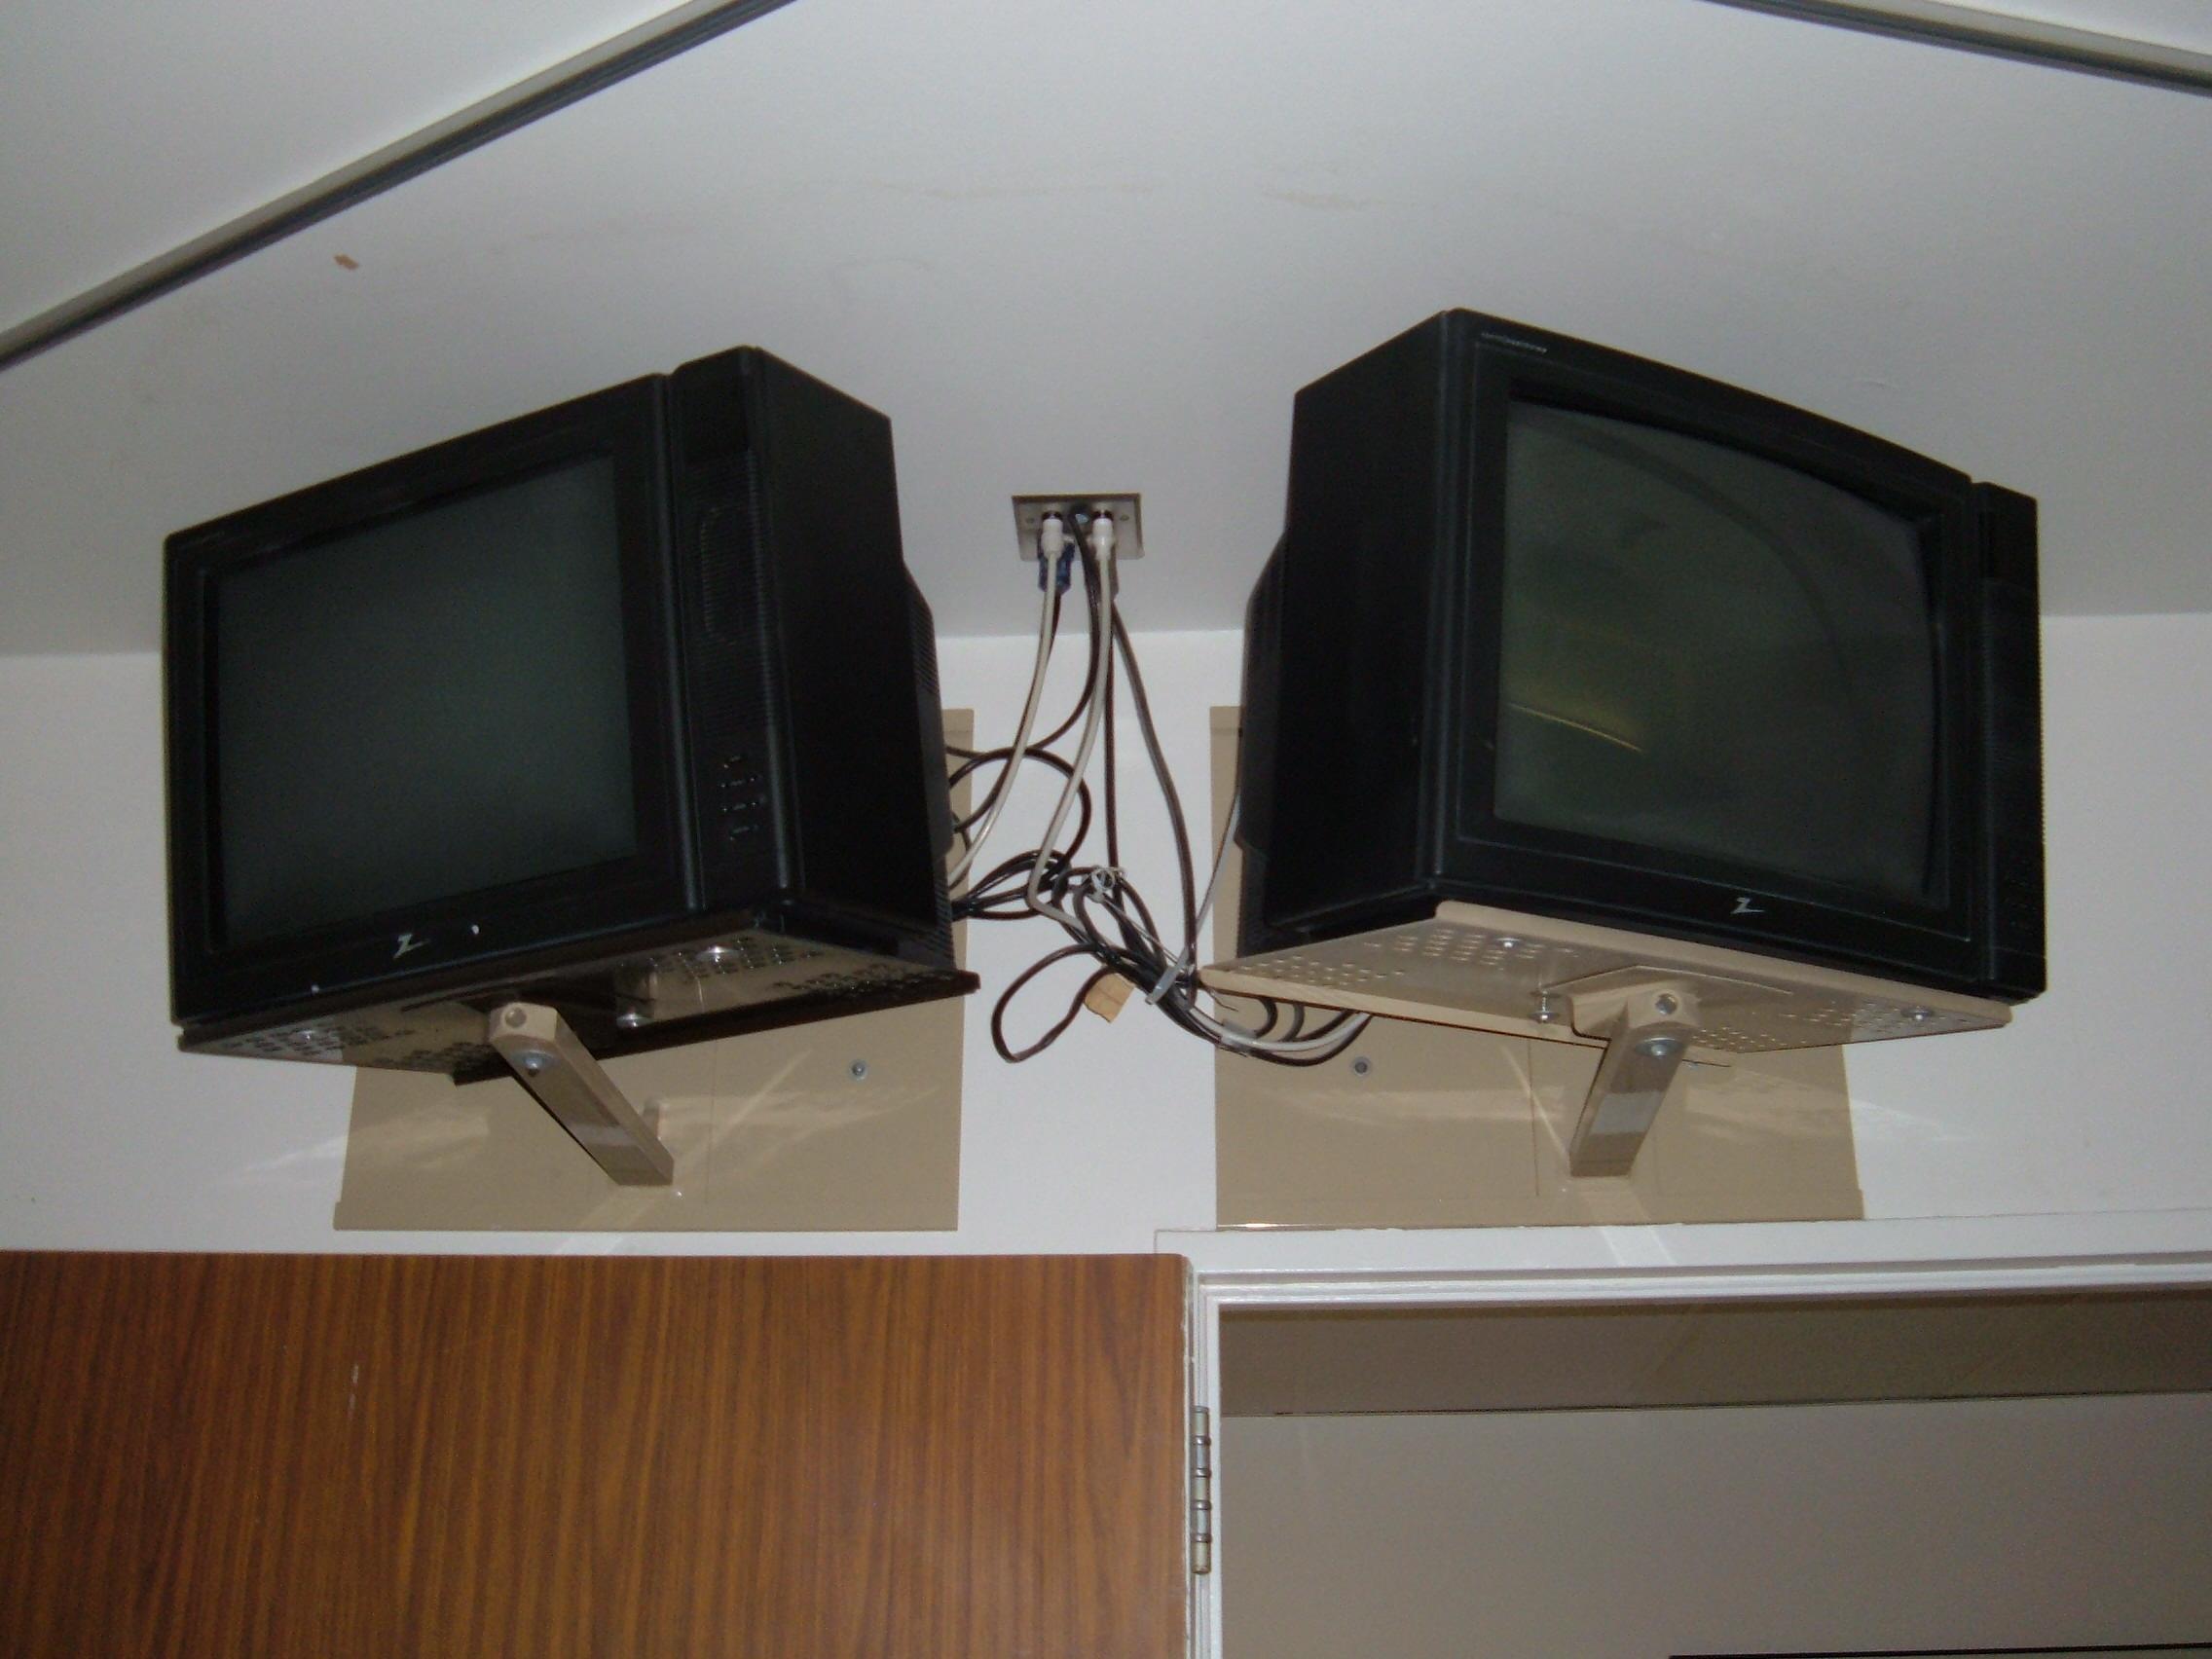 Hospital Tv Zenith Wall